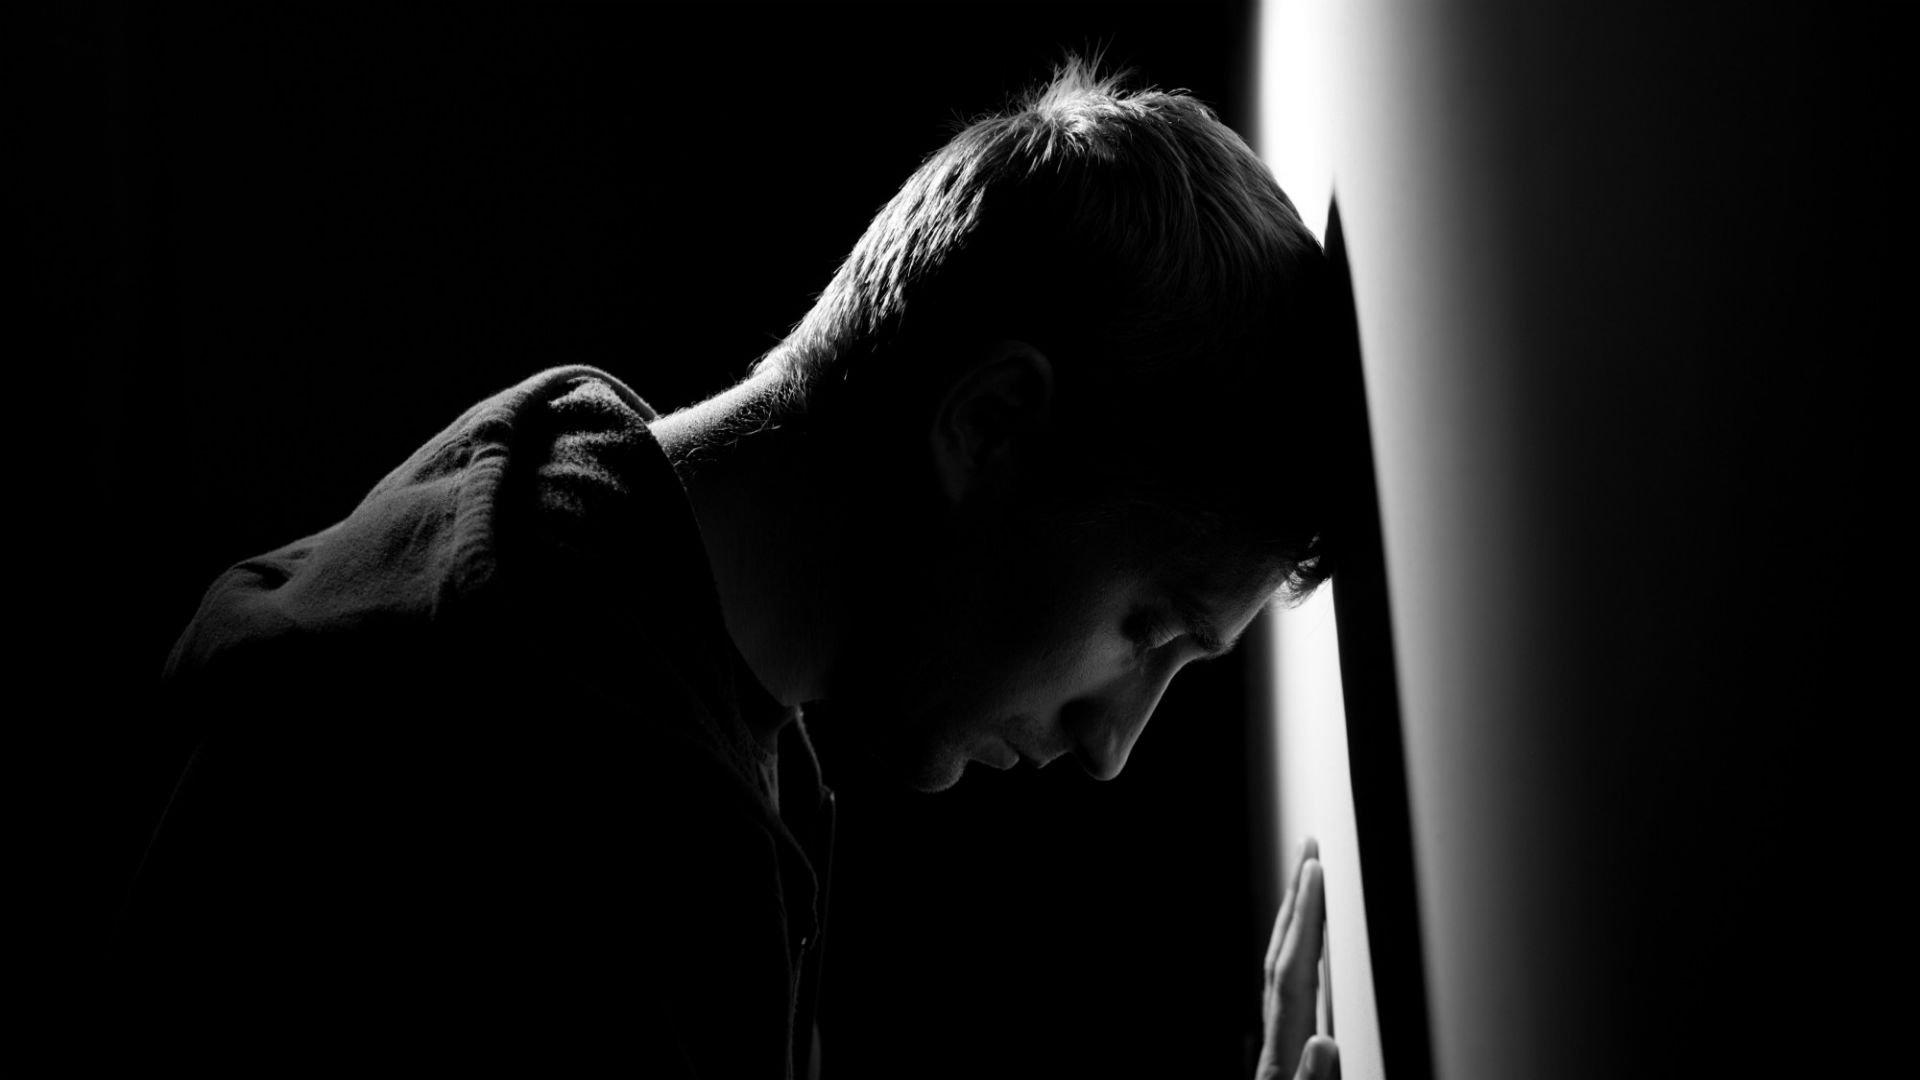 depression Sad Mood Sorrow Dark People Wallpapers HD 1920x1080